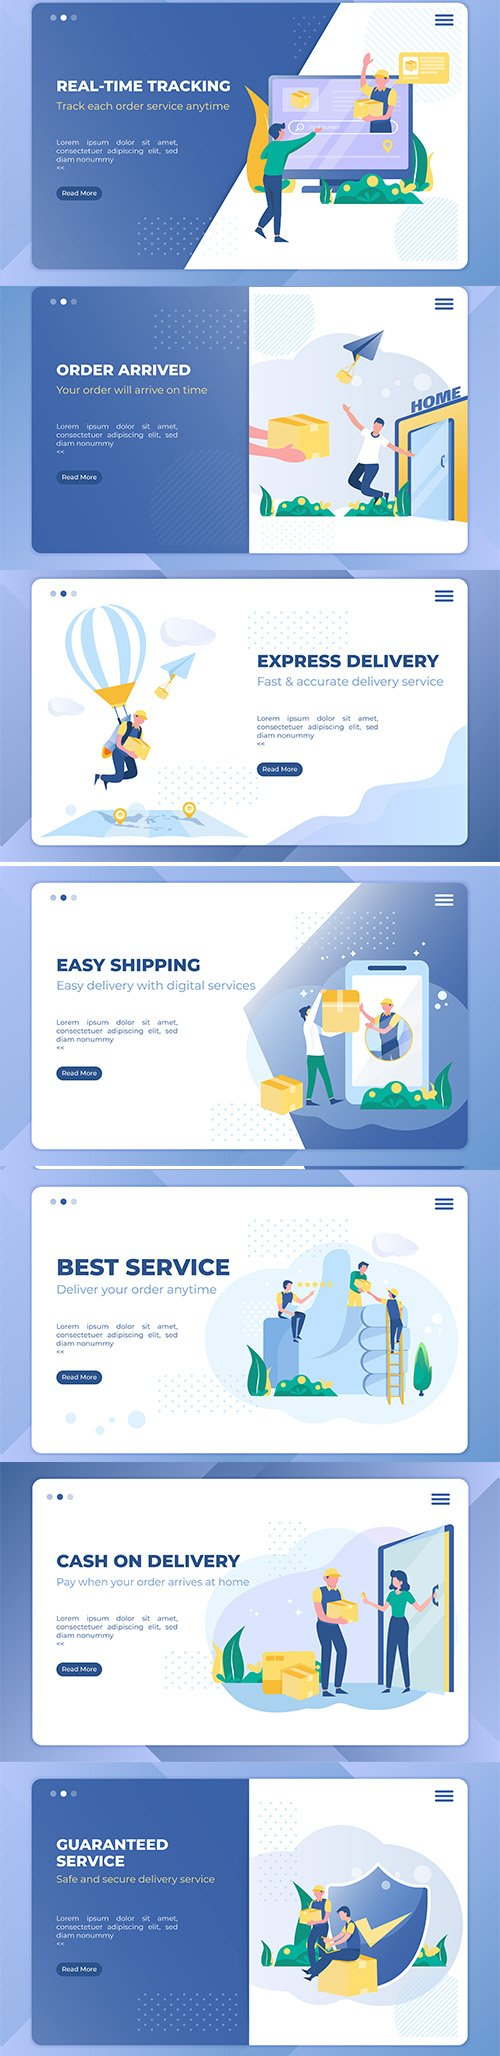 Best Delivery Service Illustration Landing Page Template Set